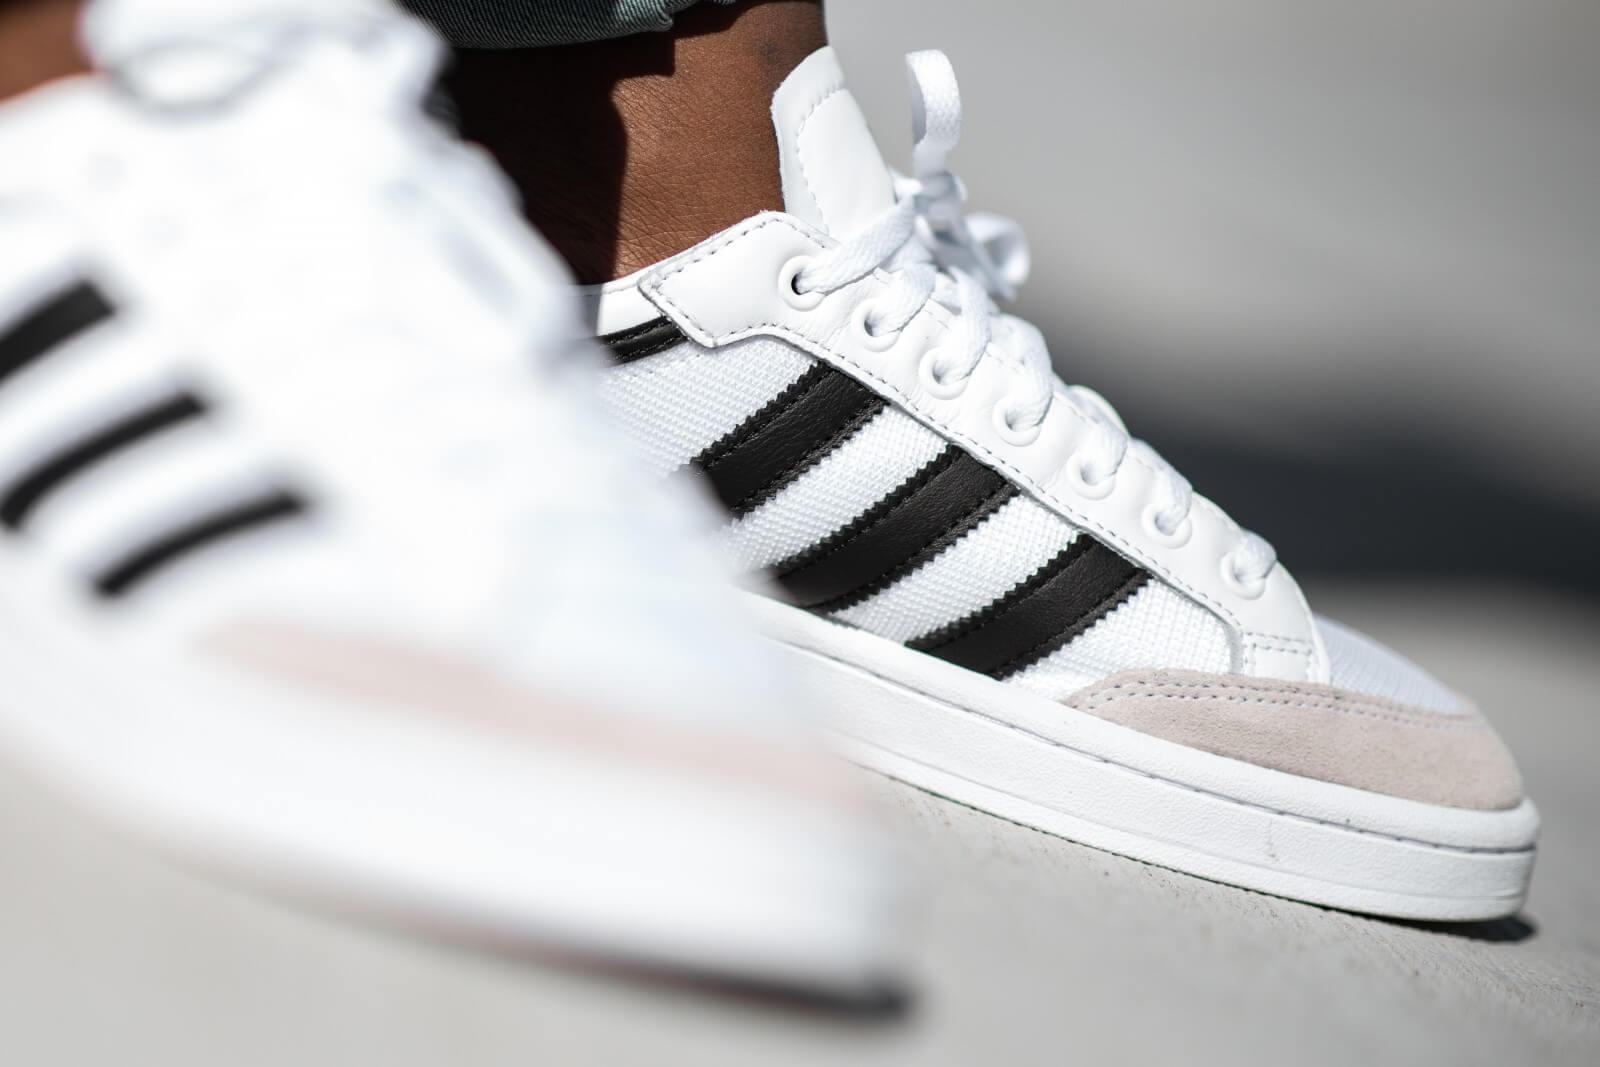 Adidas Americana Low Footwear White/Core Black